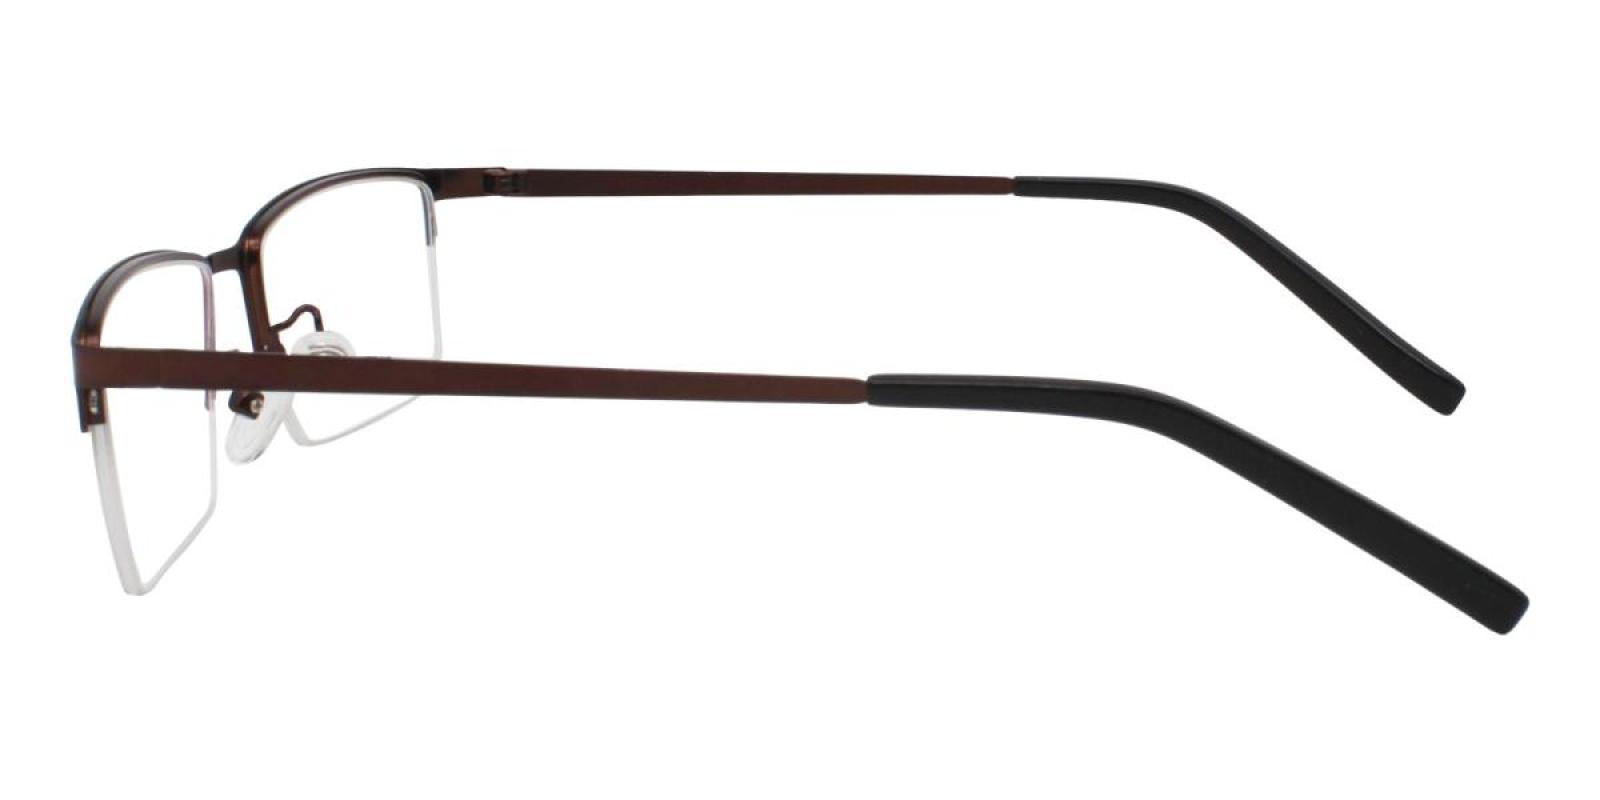 Bezel-Brown-Rectangle-Metal-Eyeglasses-additional3